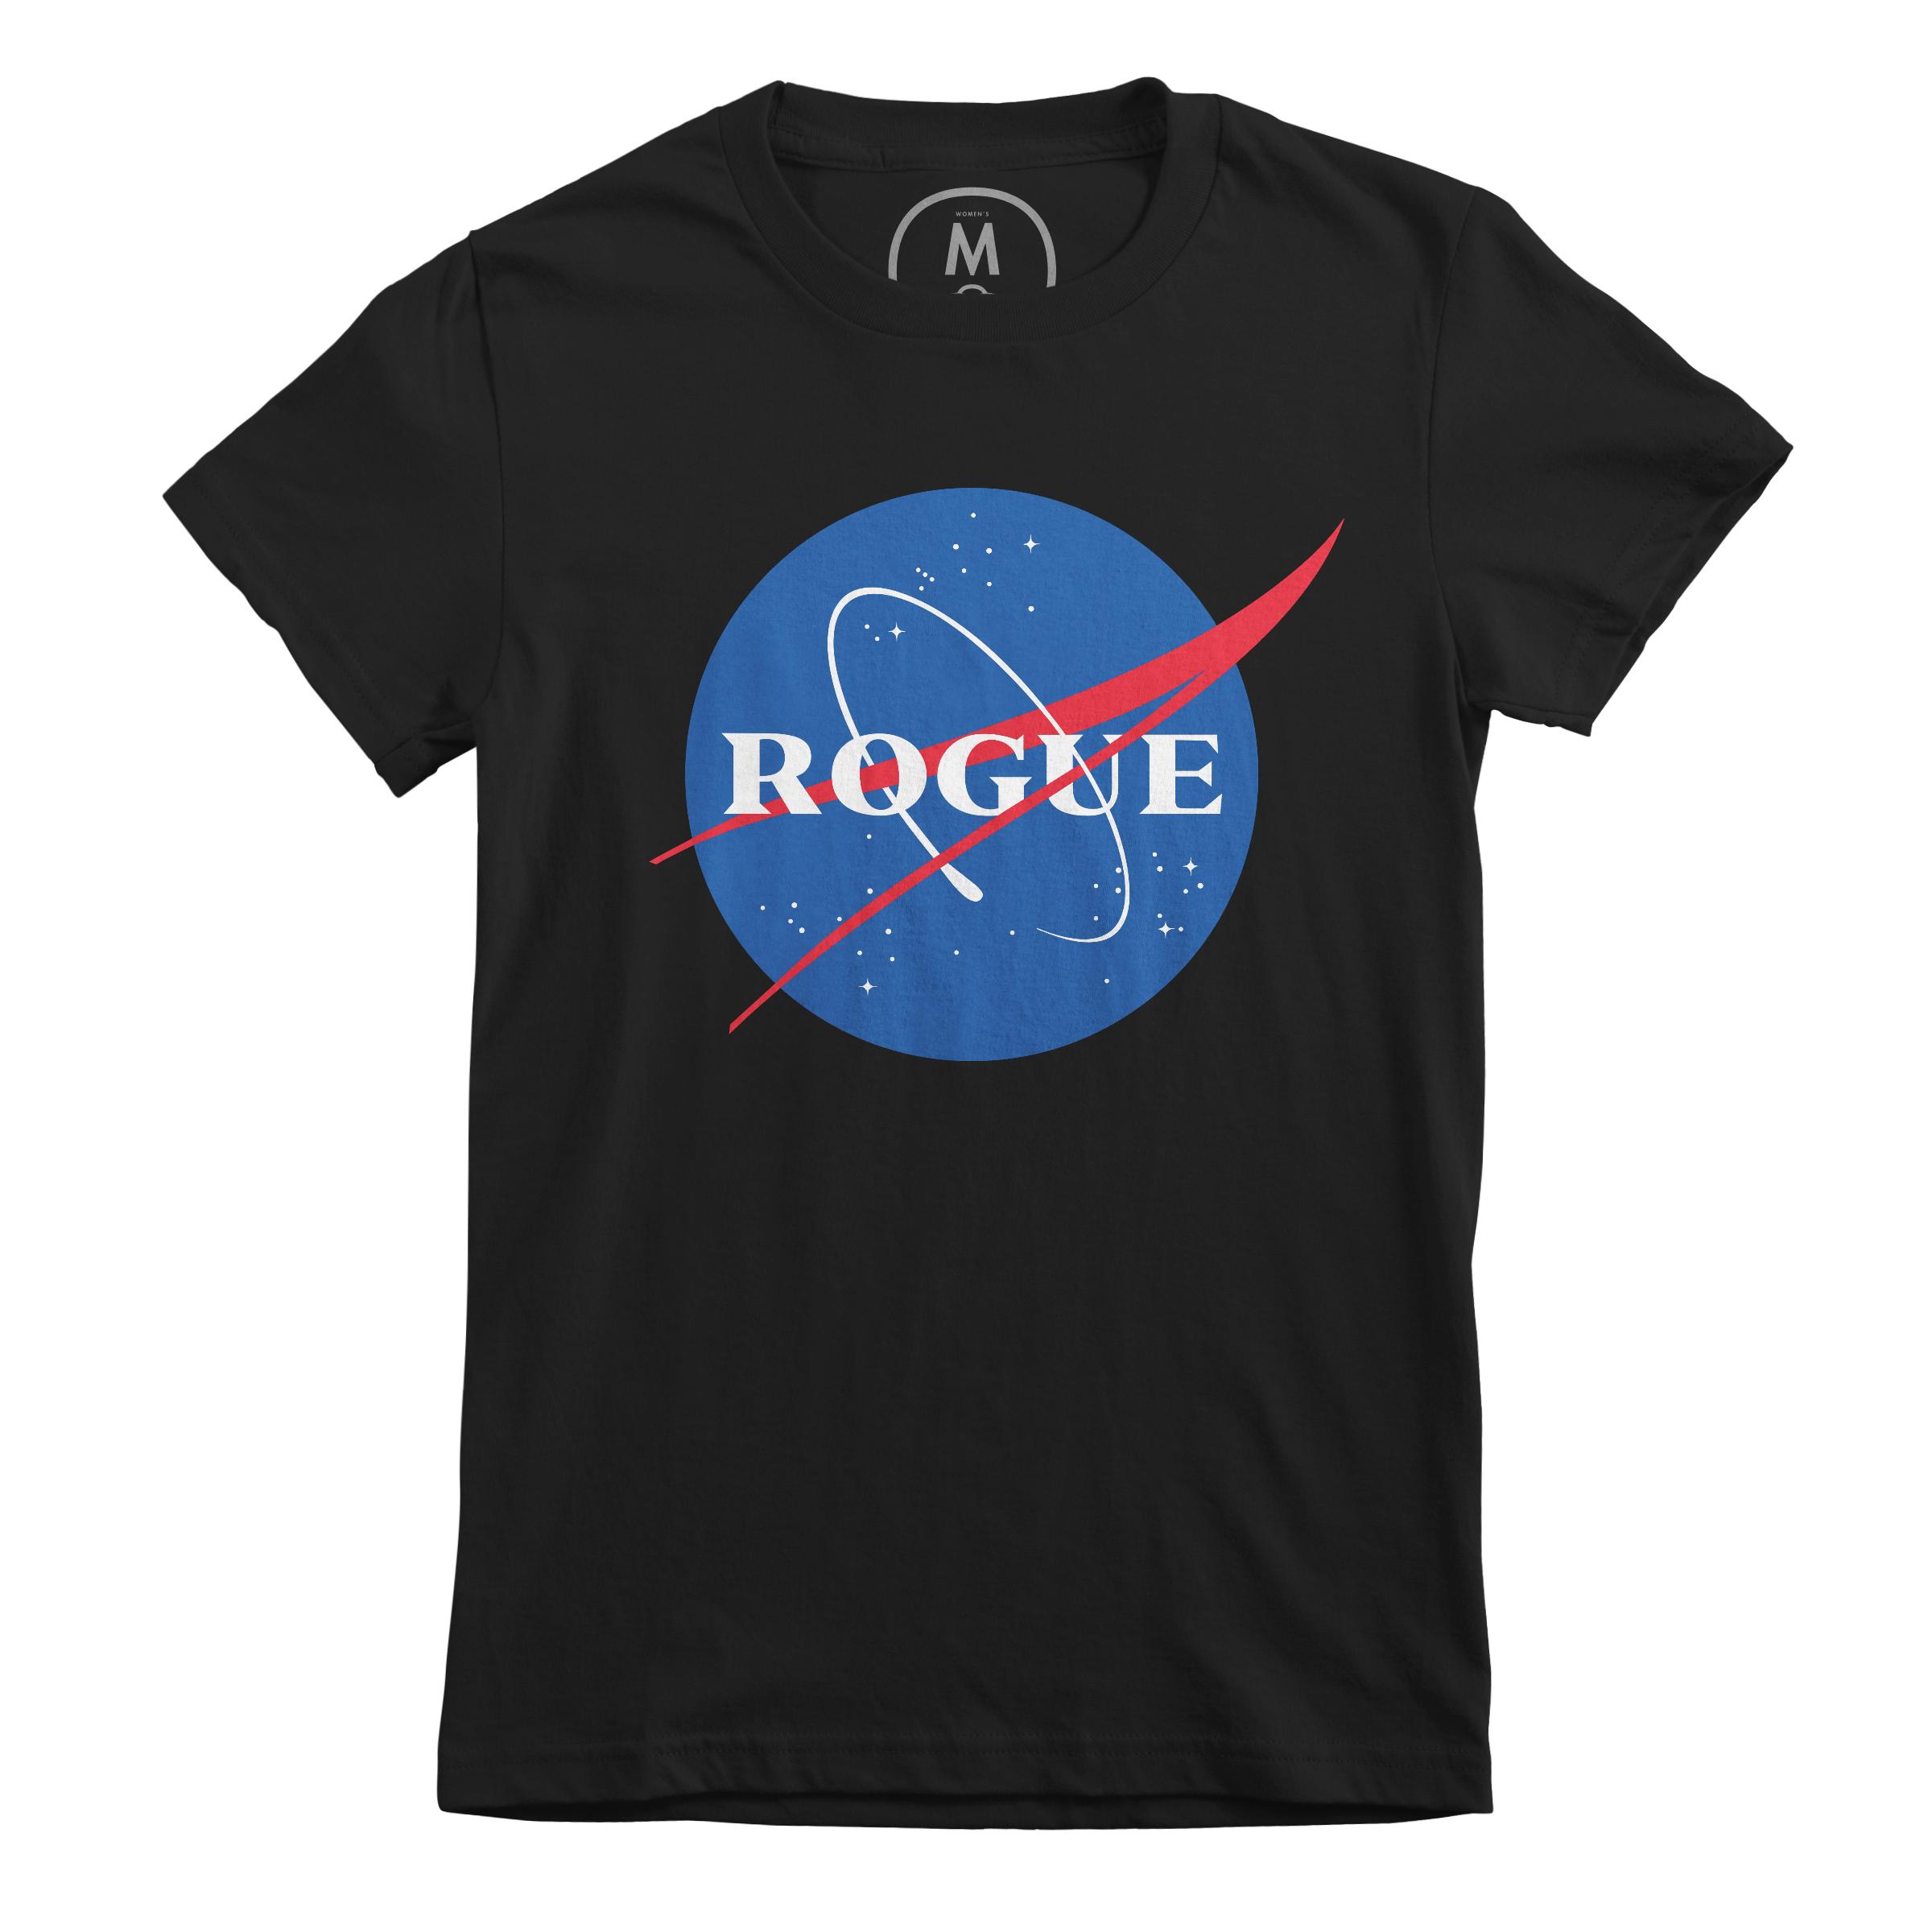 Rogue NASA Black (Women's)